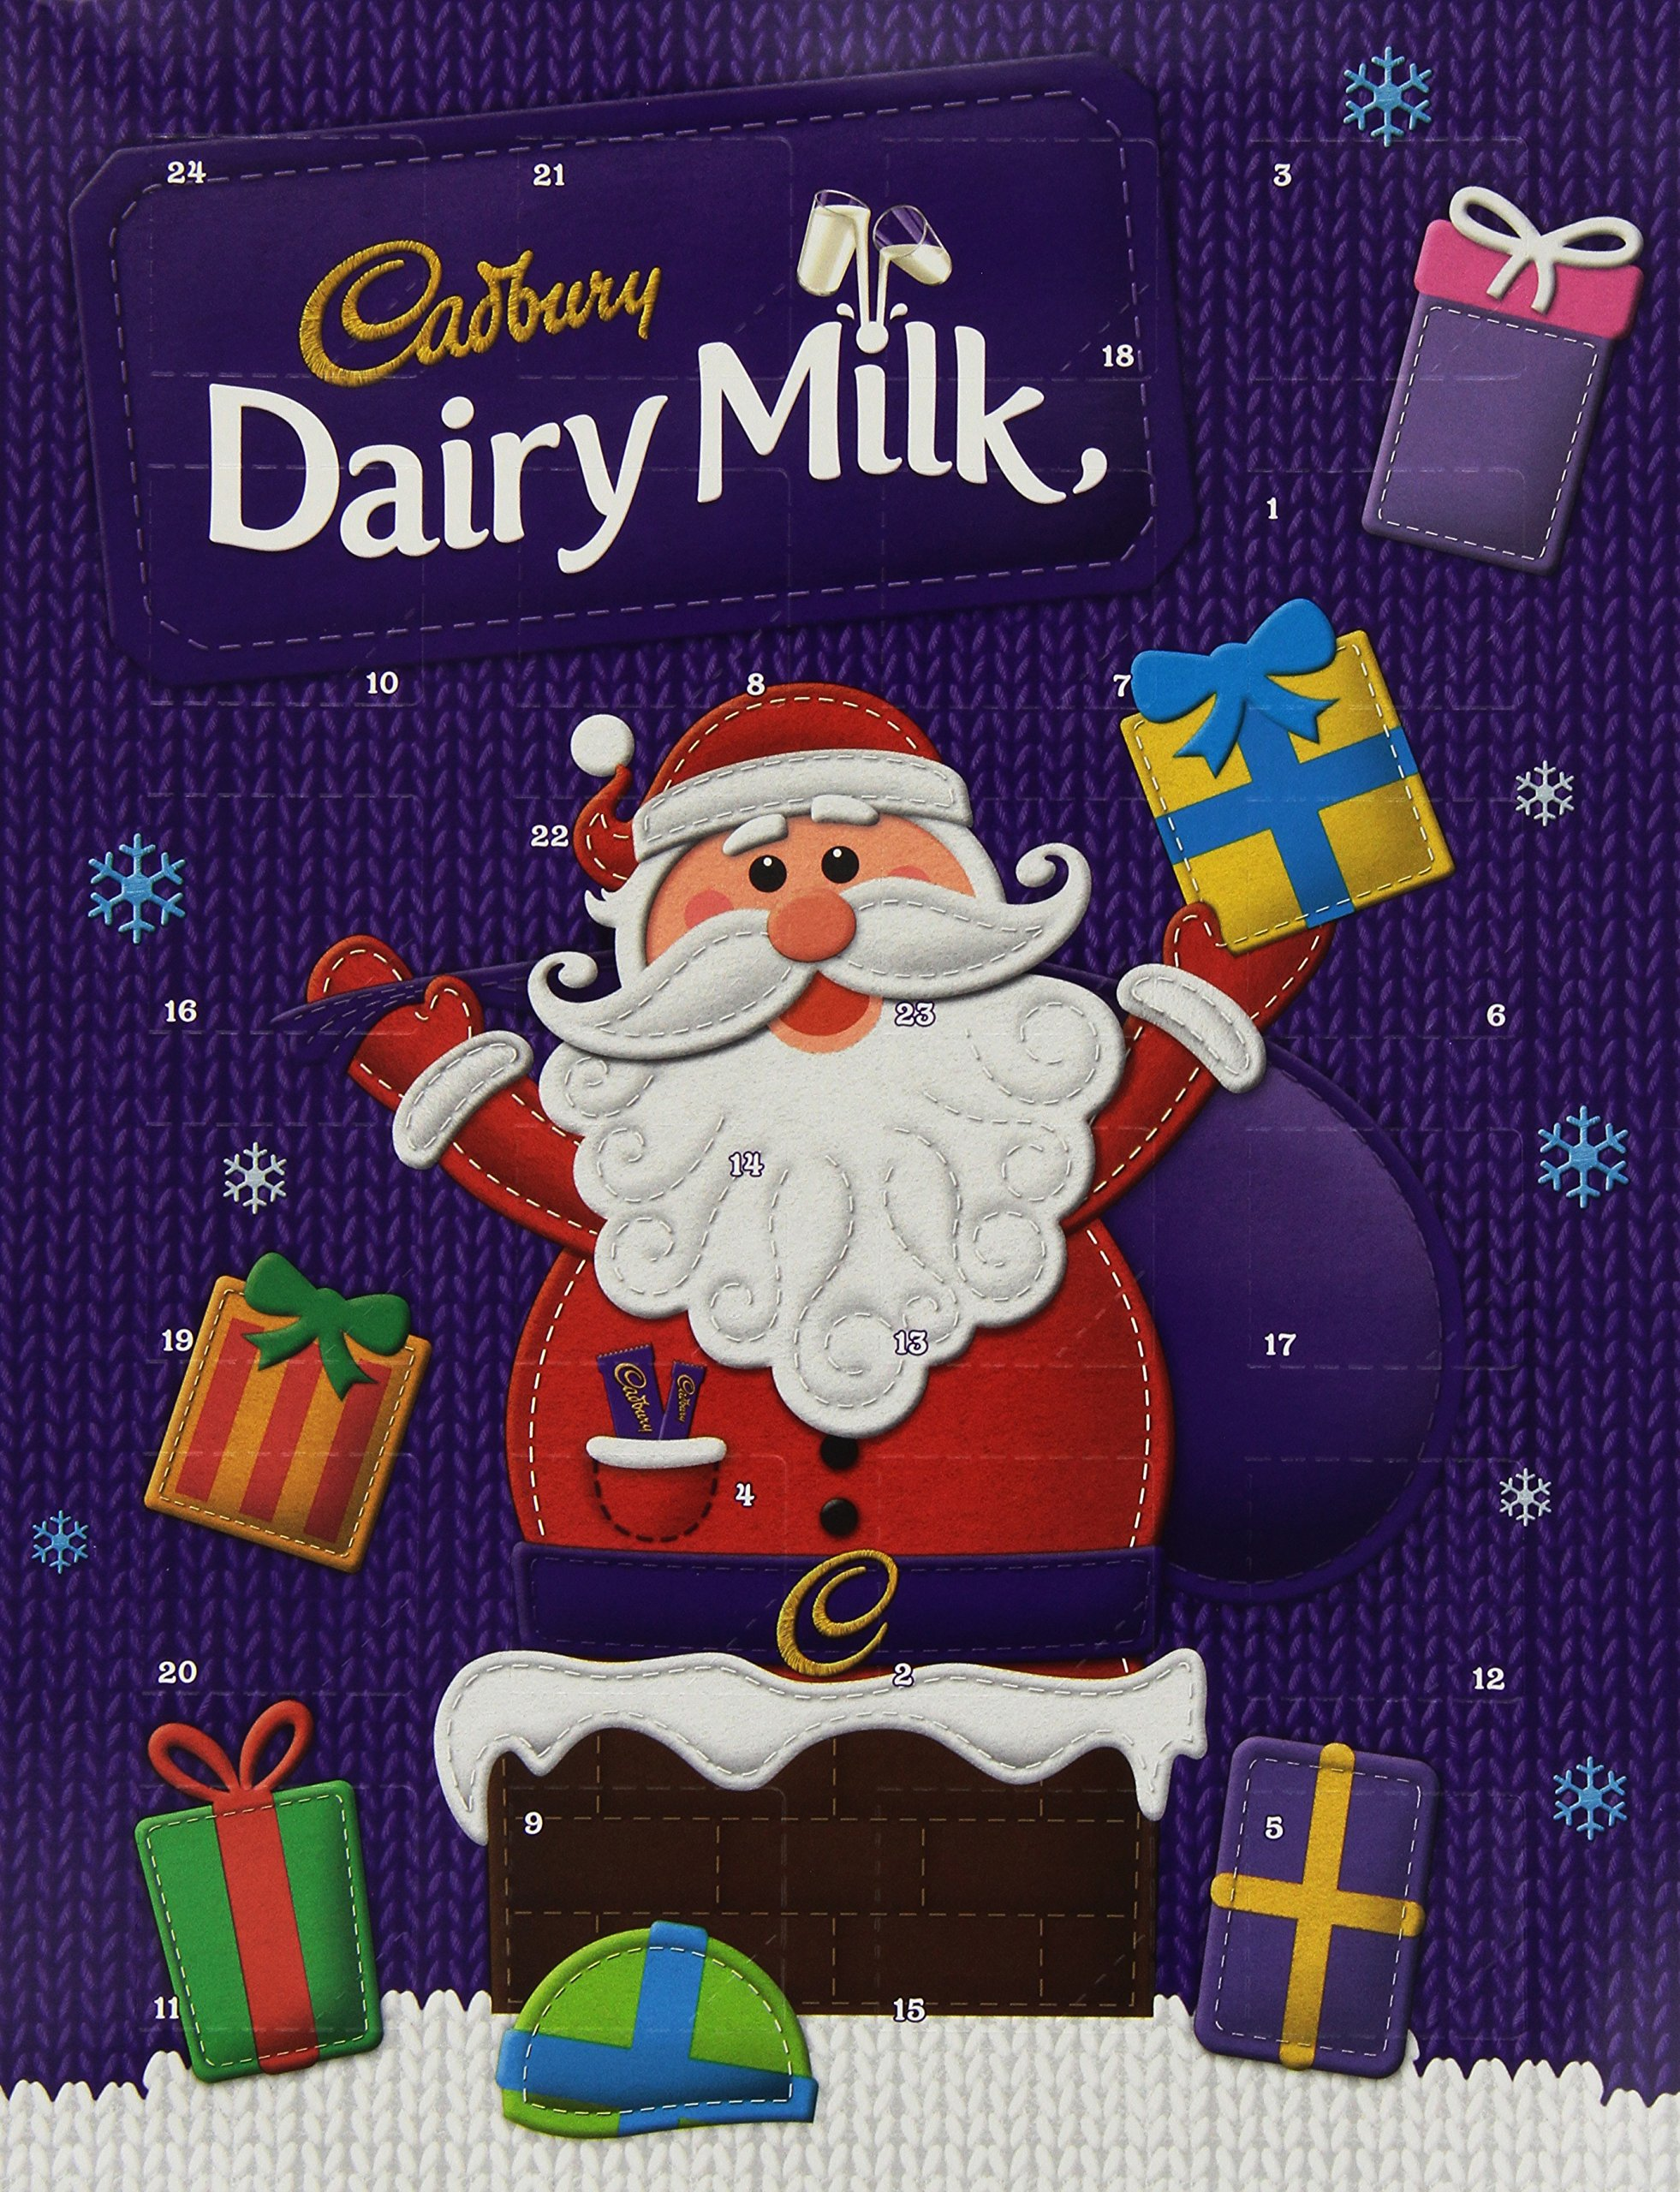 Cadbury Dairy Milk Chocolate Advent Calendar 90 Grams (Pack of 6)